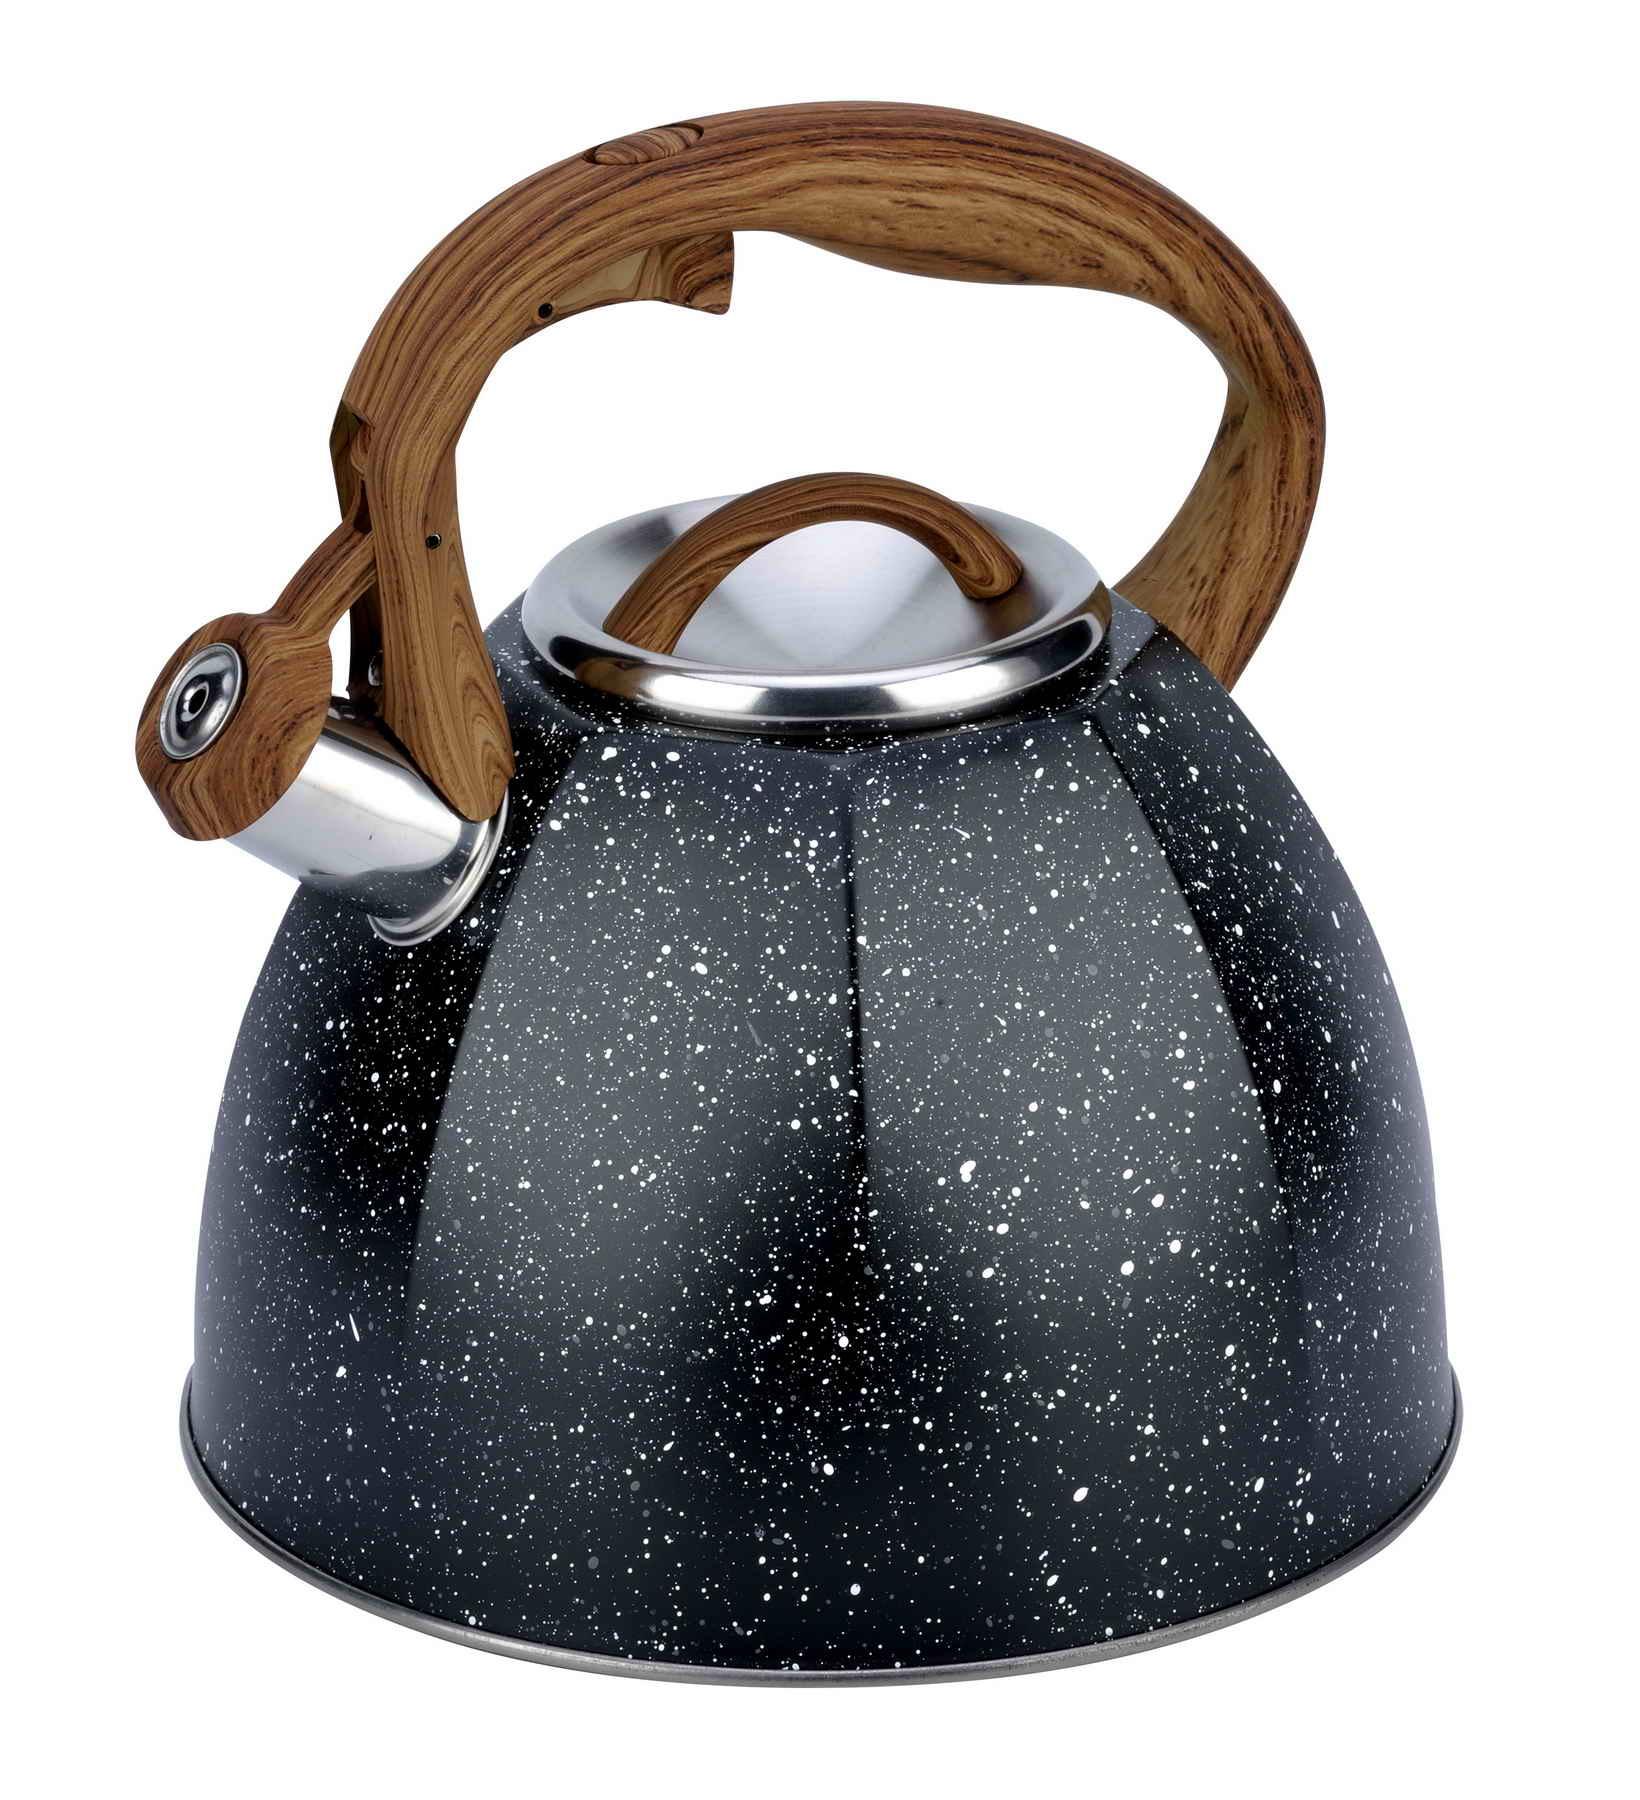 Marble coating kettle